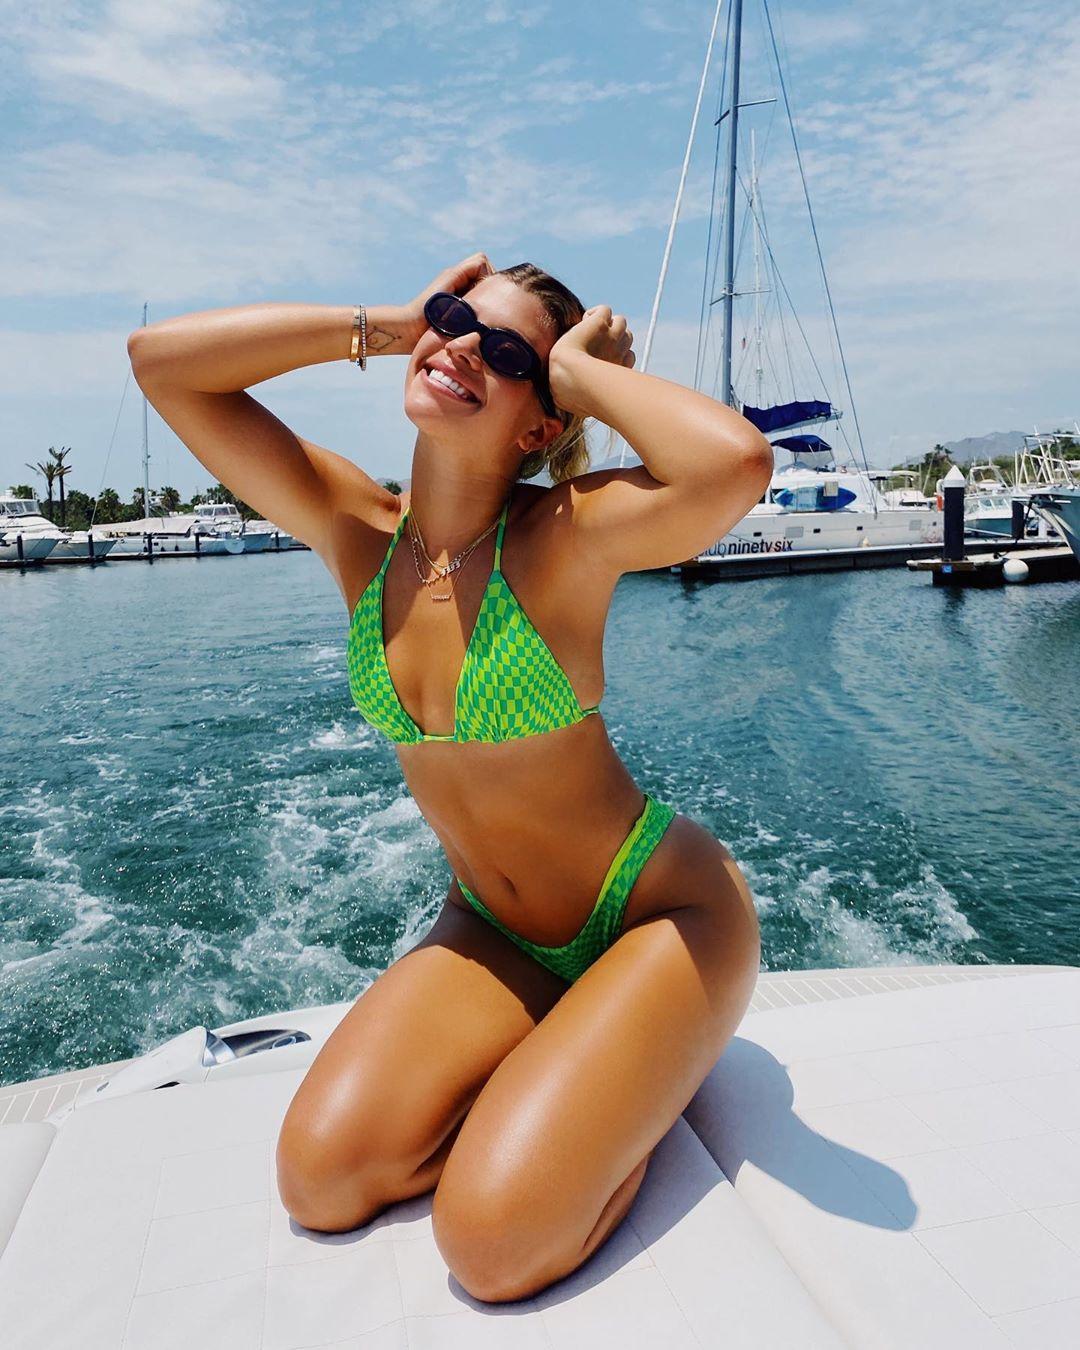 Sofia Richie is All Smiles in a Bikini Following Scott Disick Split